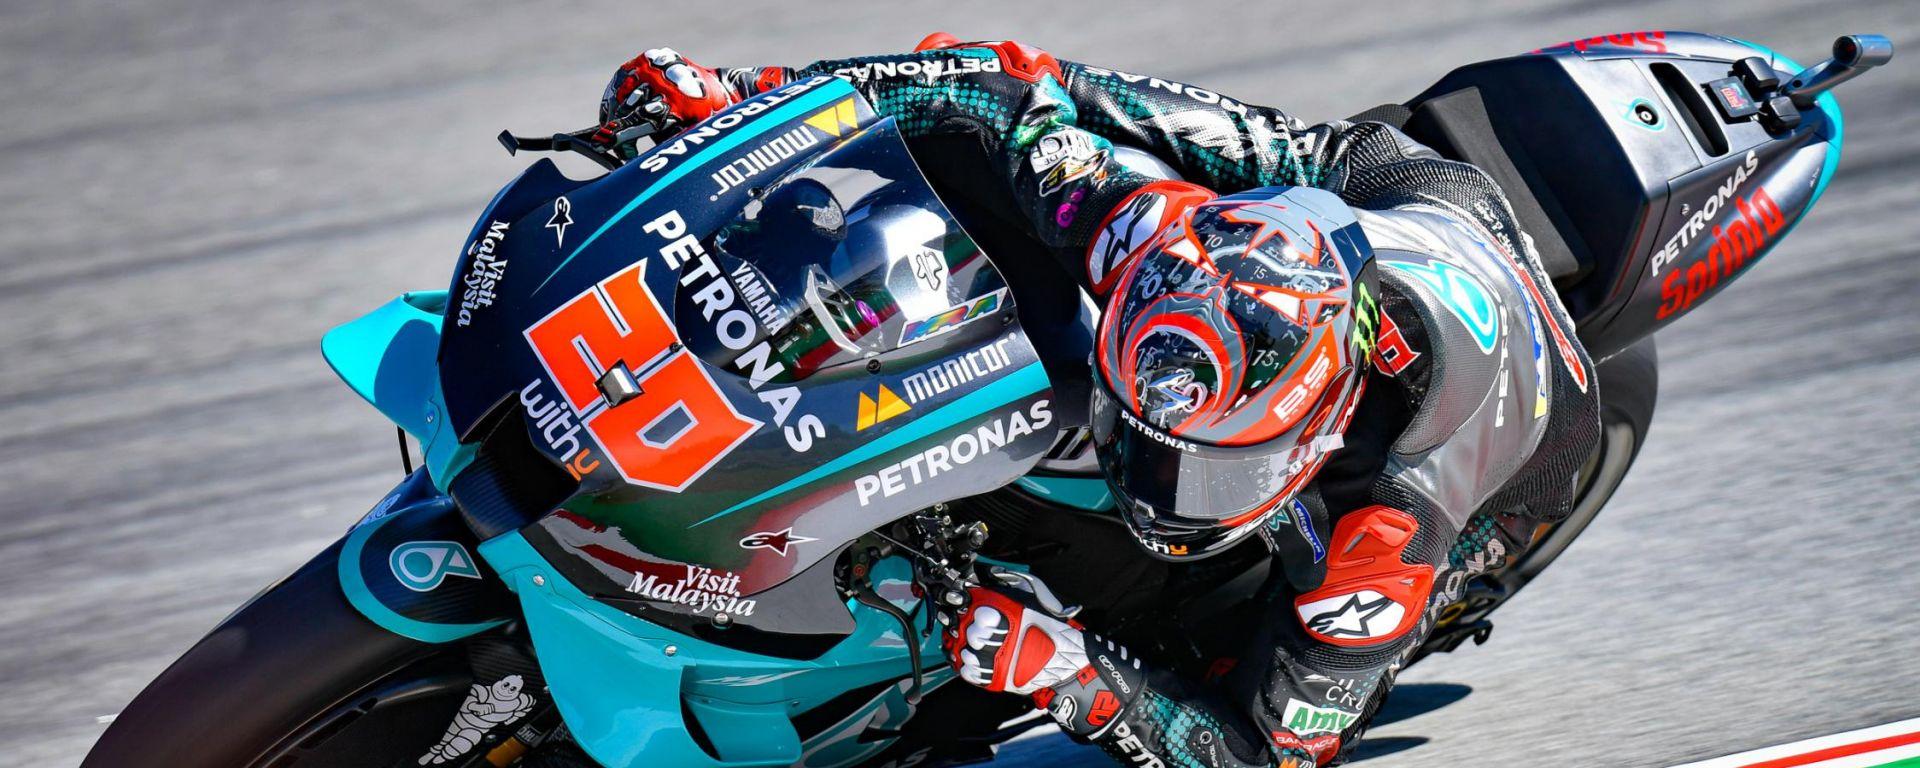 MotoGP Catalunya 2020: Trionfo Quartararo! Rossi la butta via